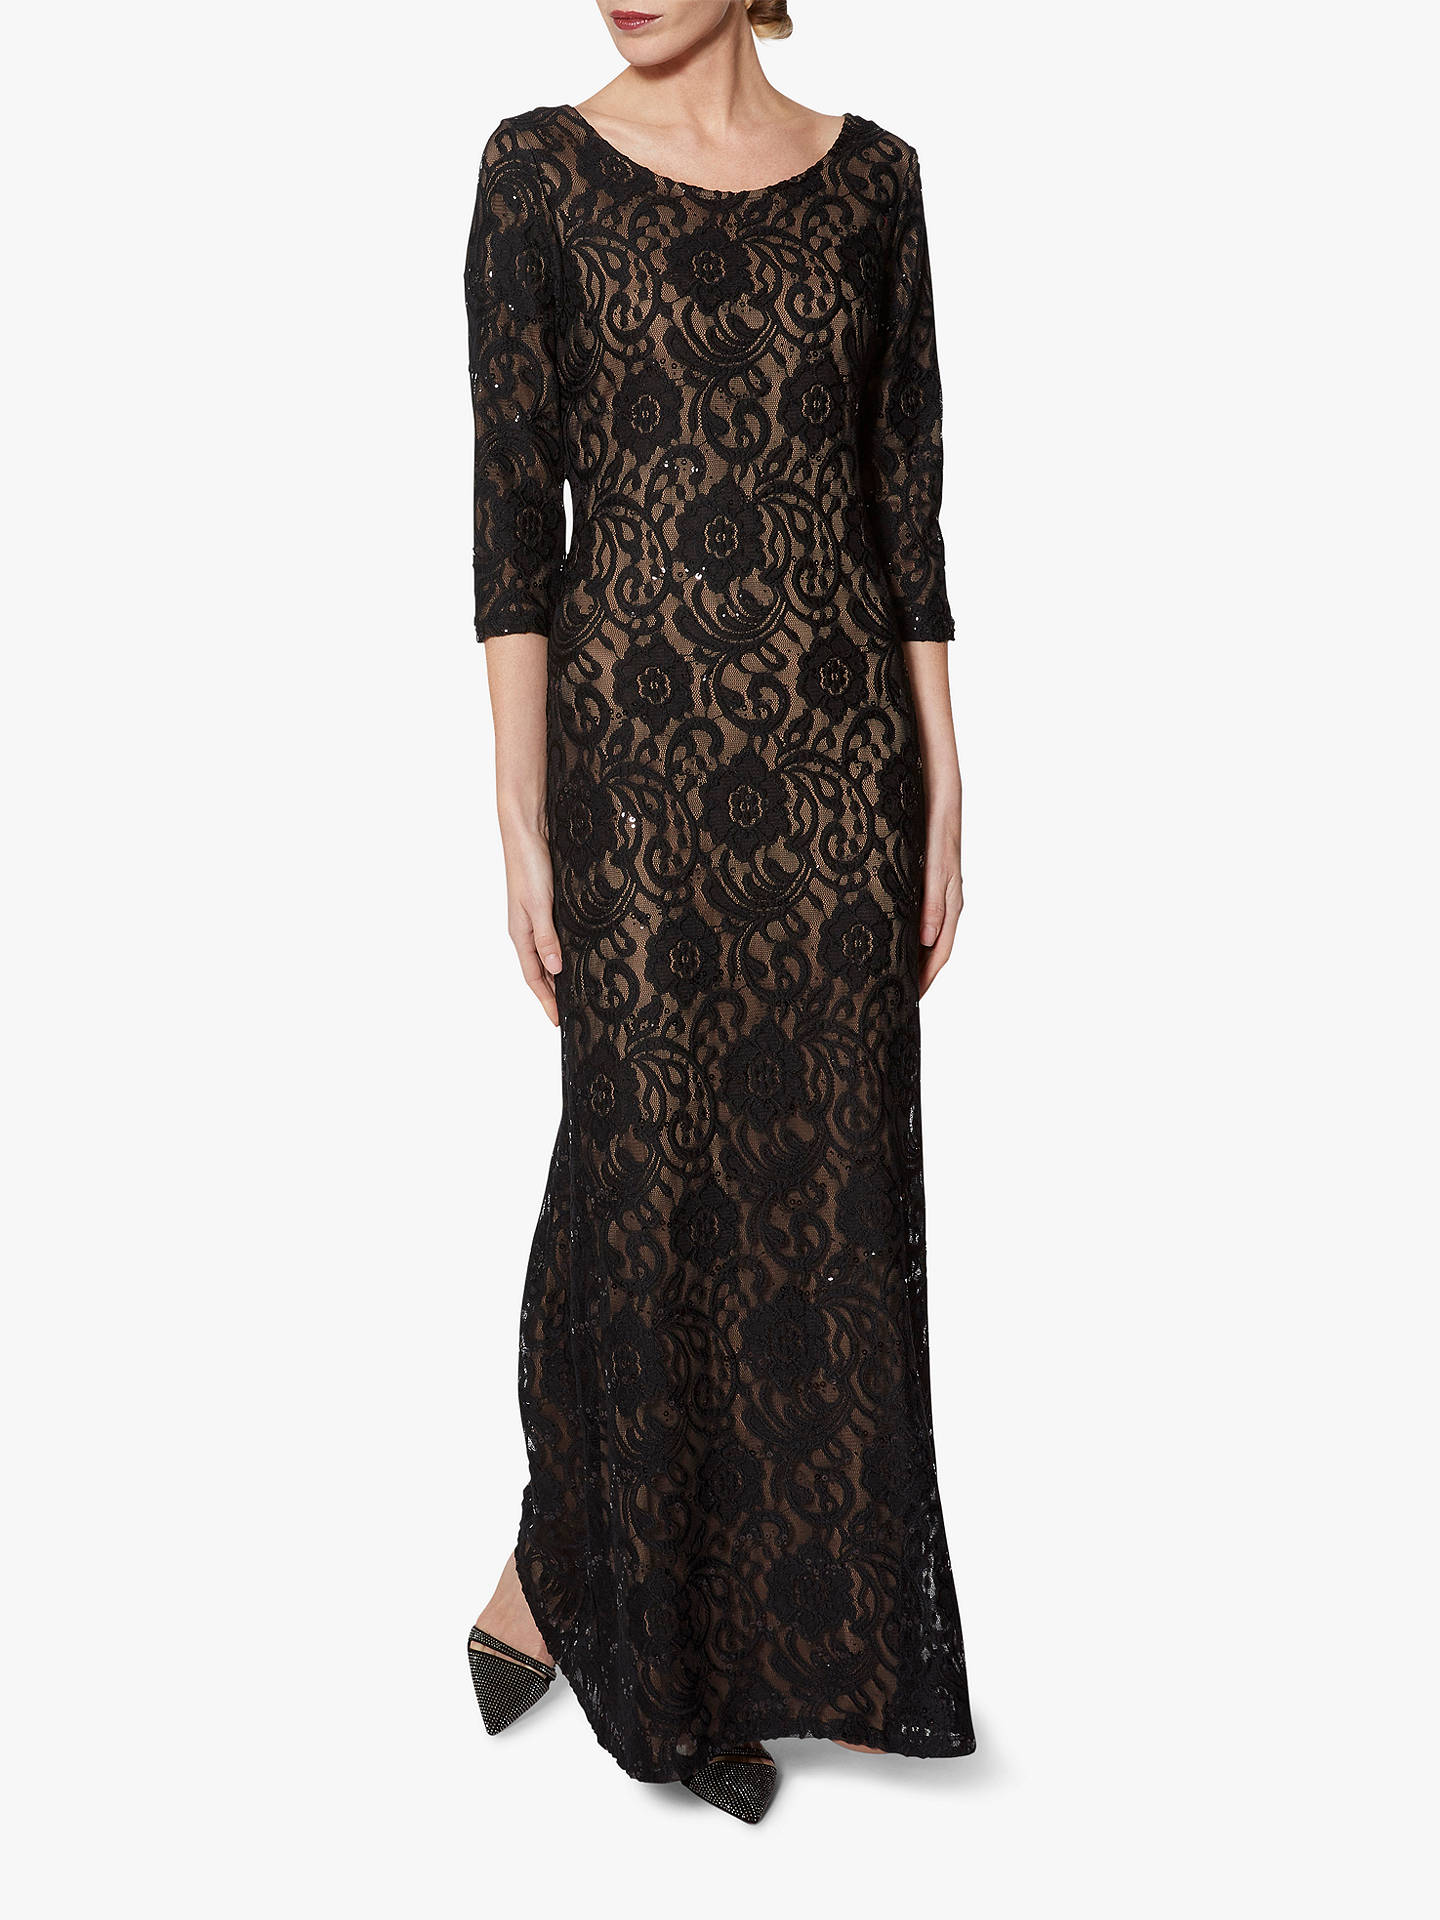 b90447ffe6c Gina Bacconi Mirabella Lace Overlay Maxi Dress, Black